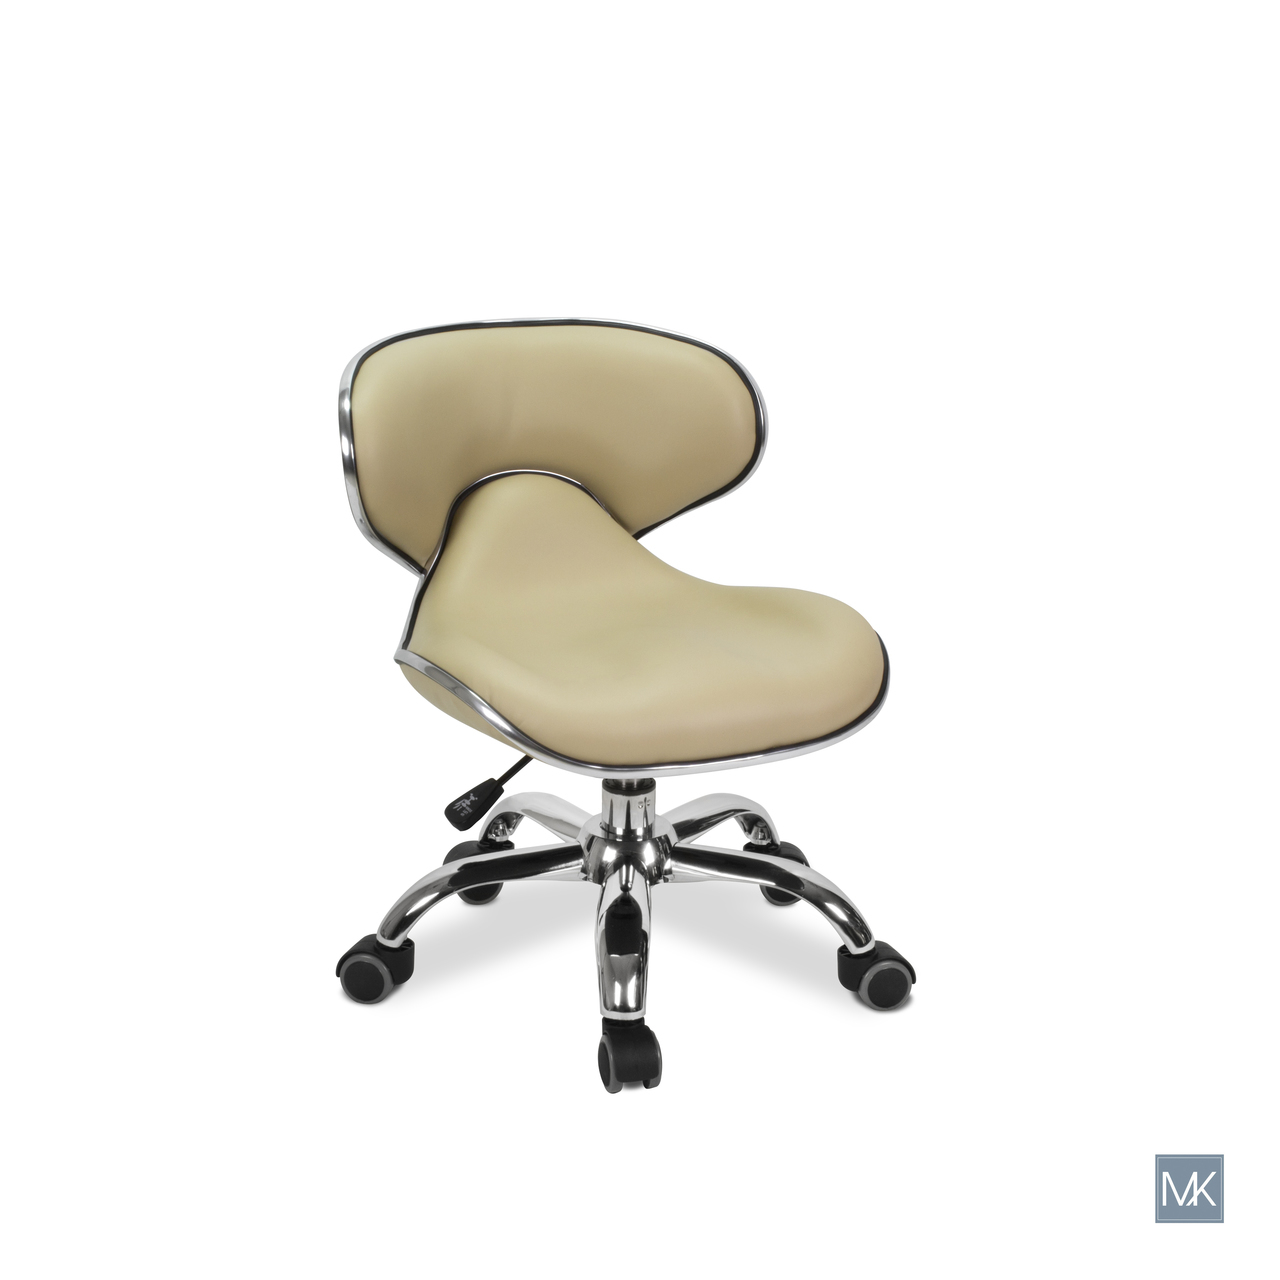 Umi Pedicure Stool Customer Technician Chairs Amp Stools